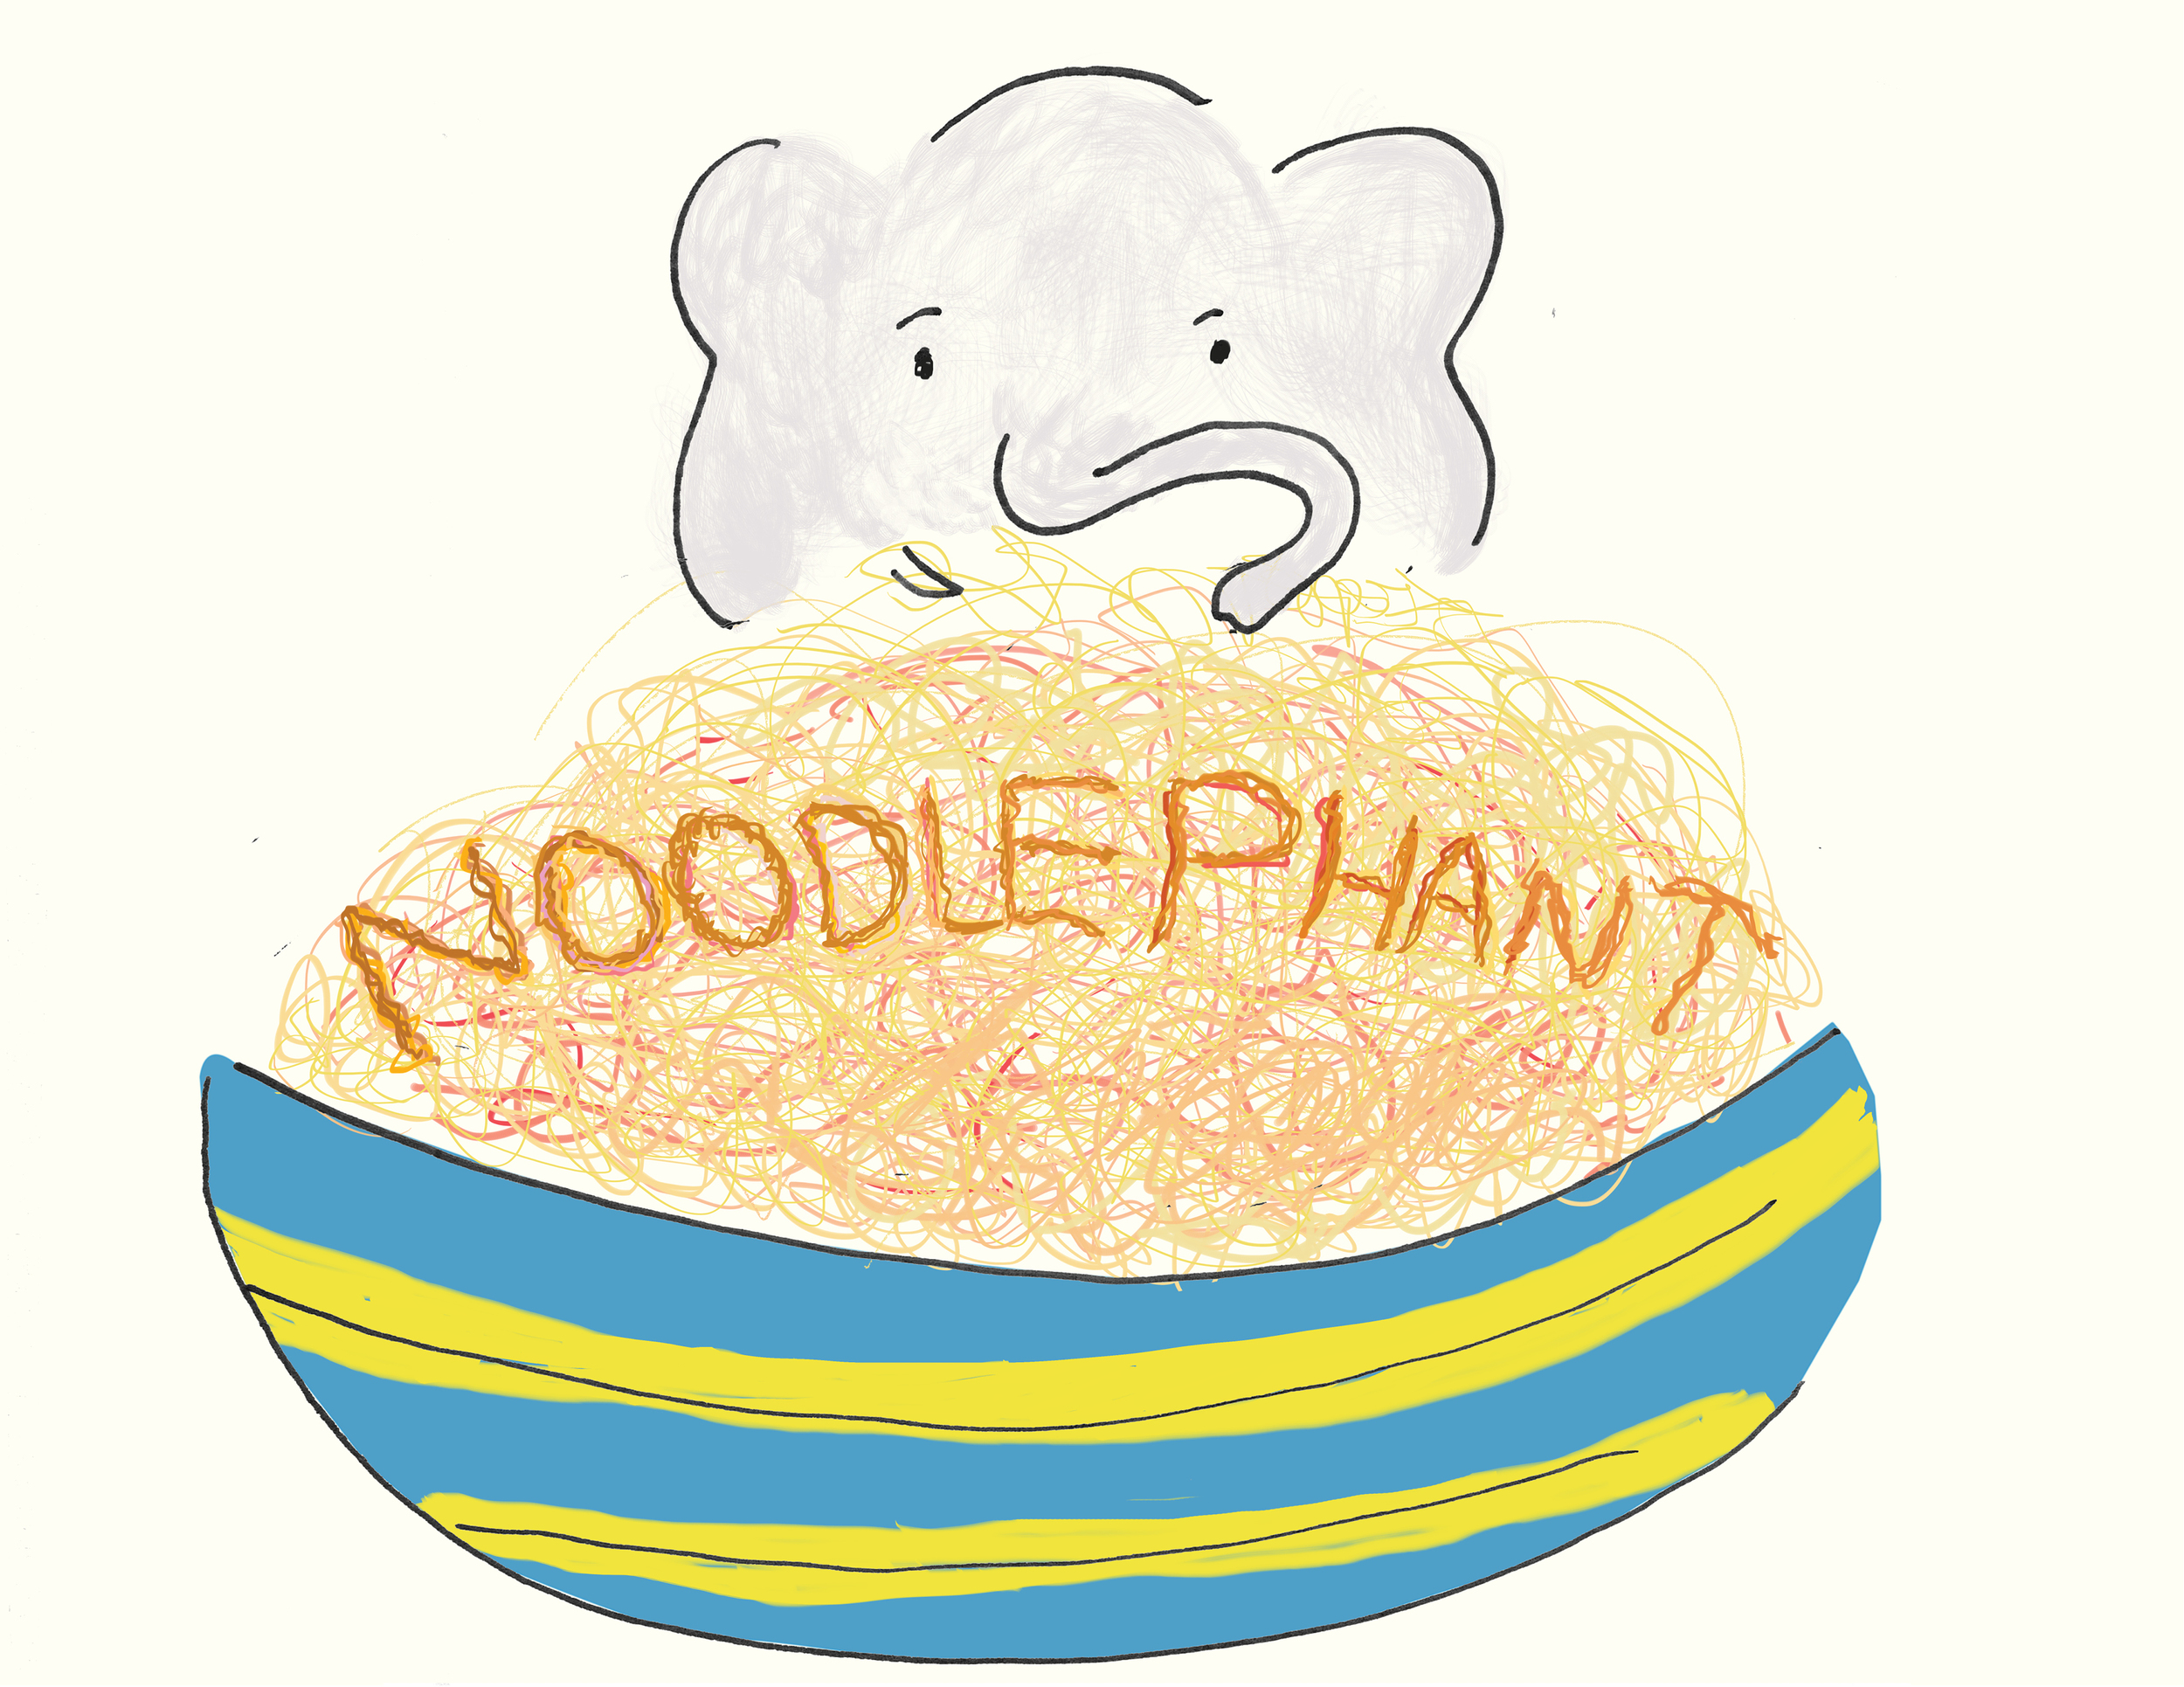 noodlephant_final.jpg